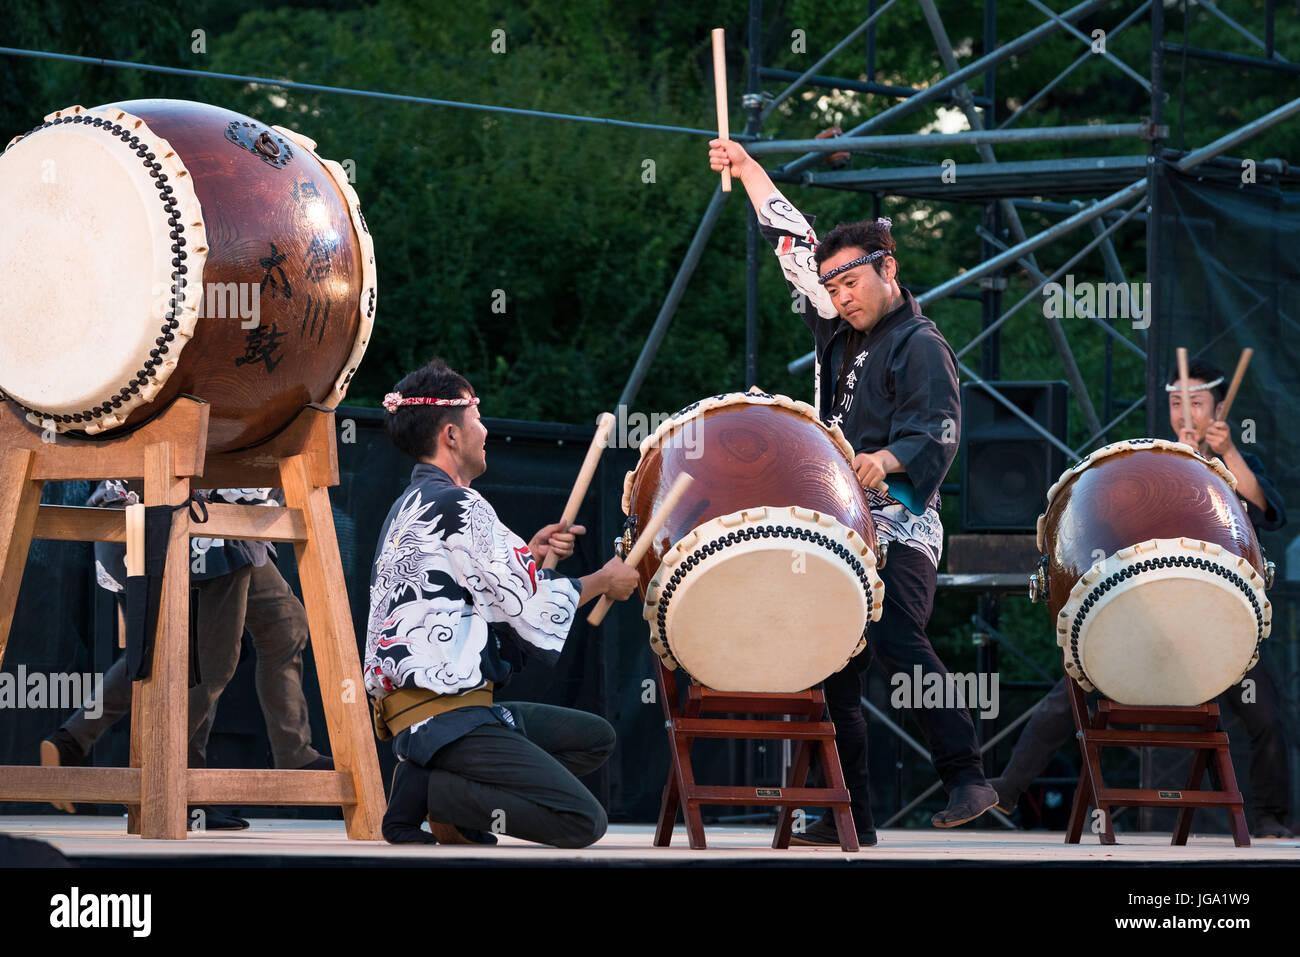 Japanese drum virtuosos during the show at Matsumoto Drum festival. Matsumoto Taiko Matsuri. Japan - Stock Image